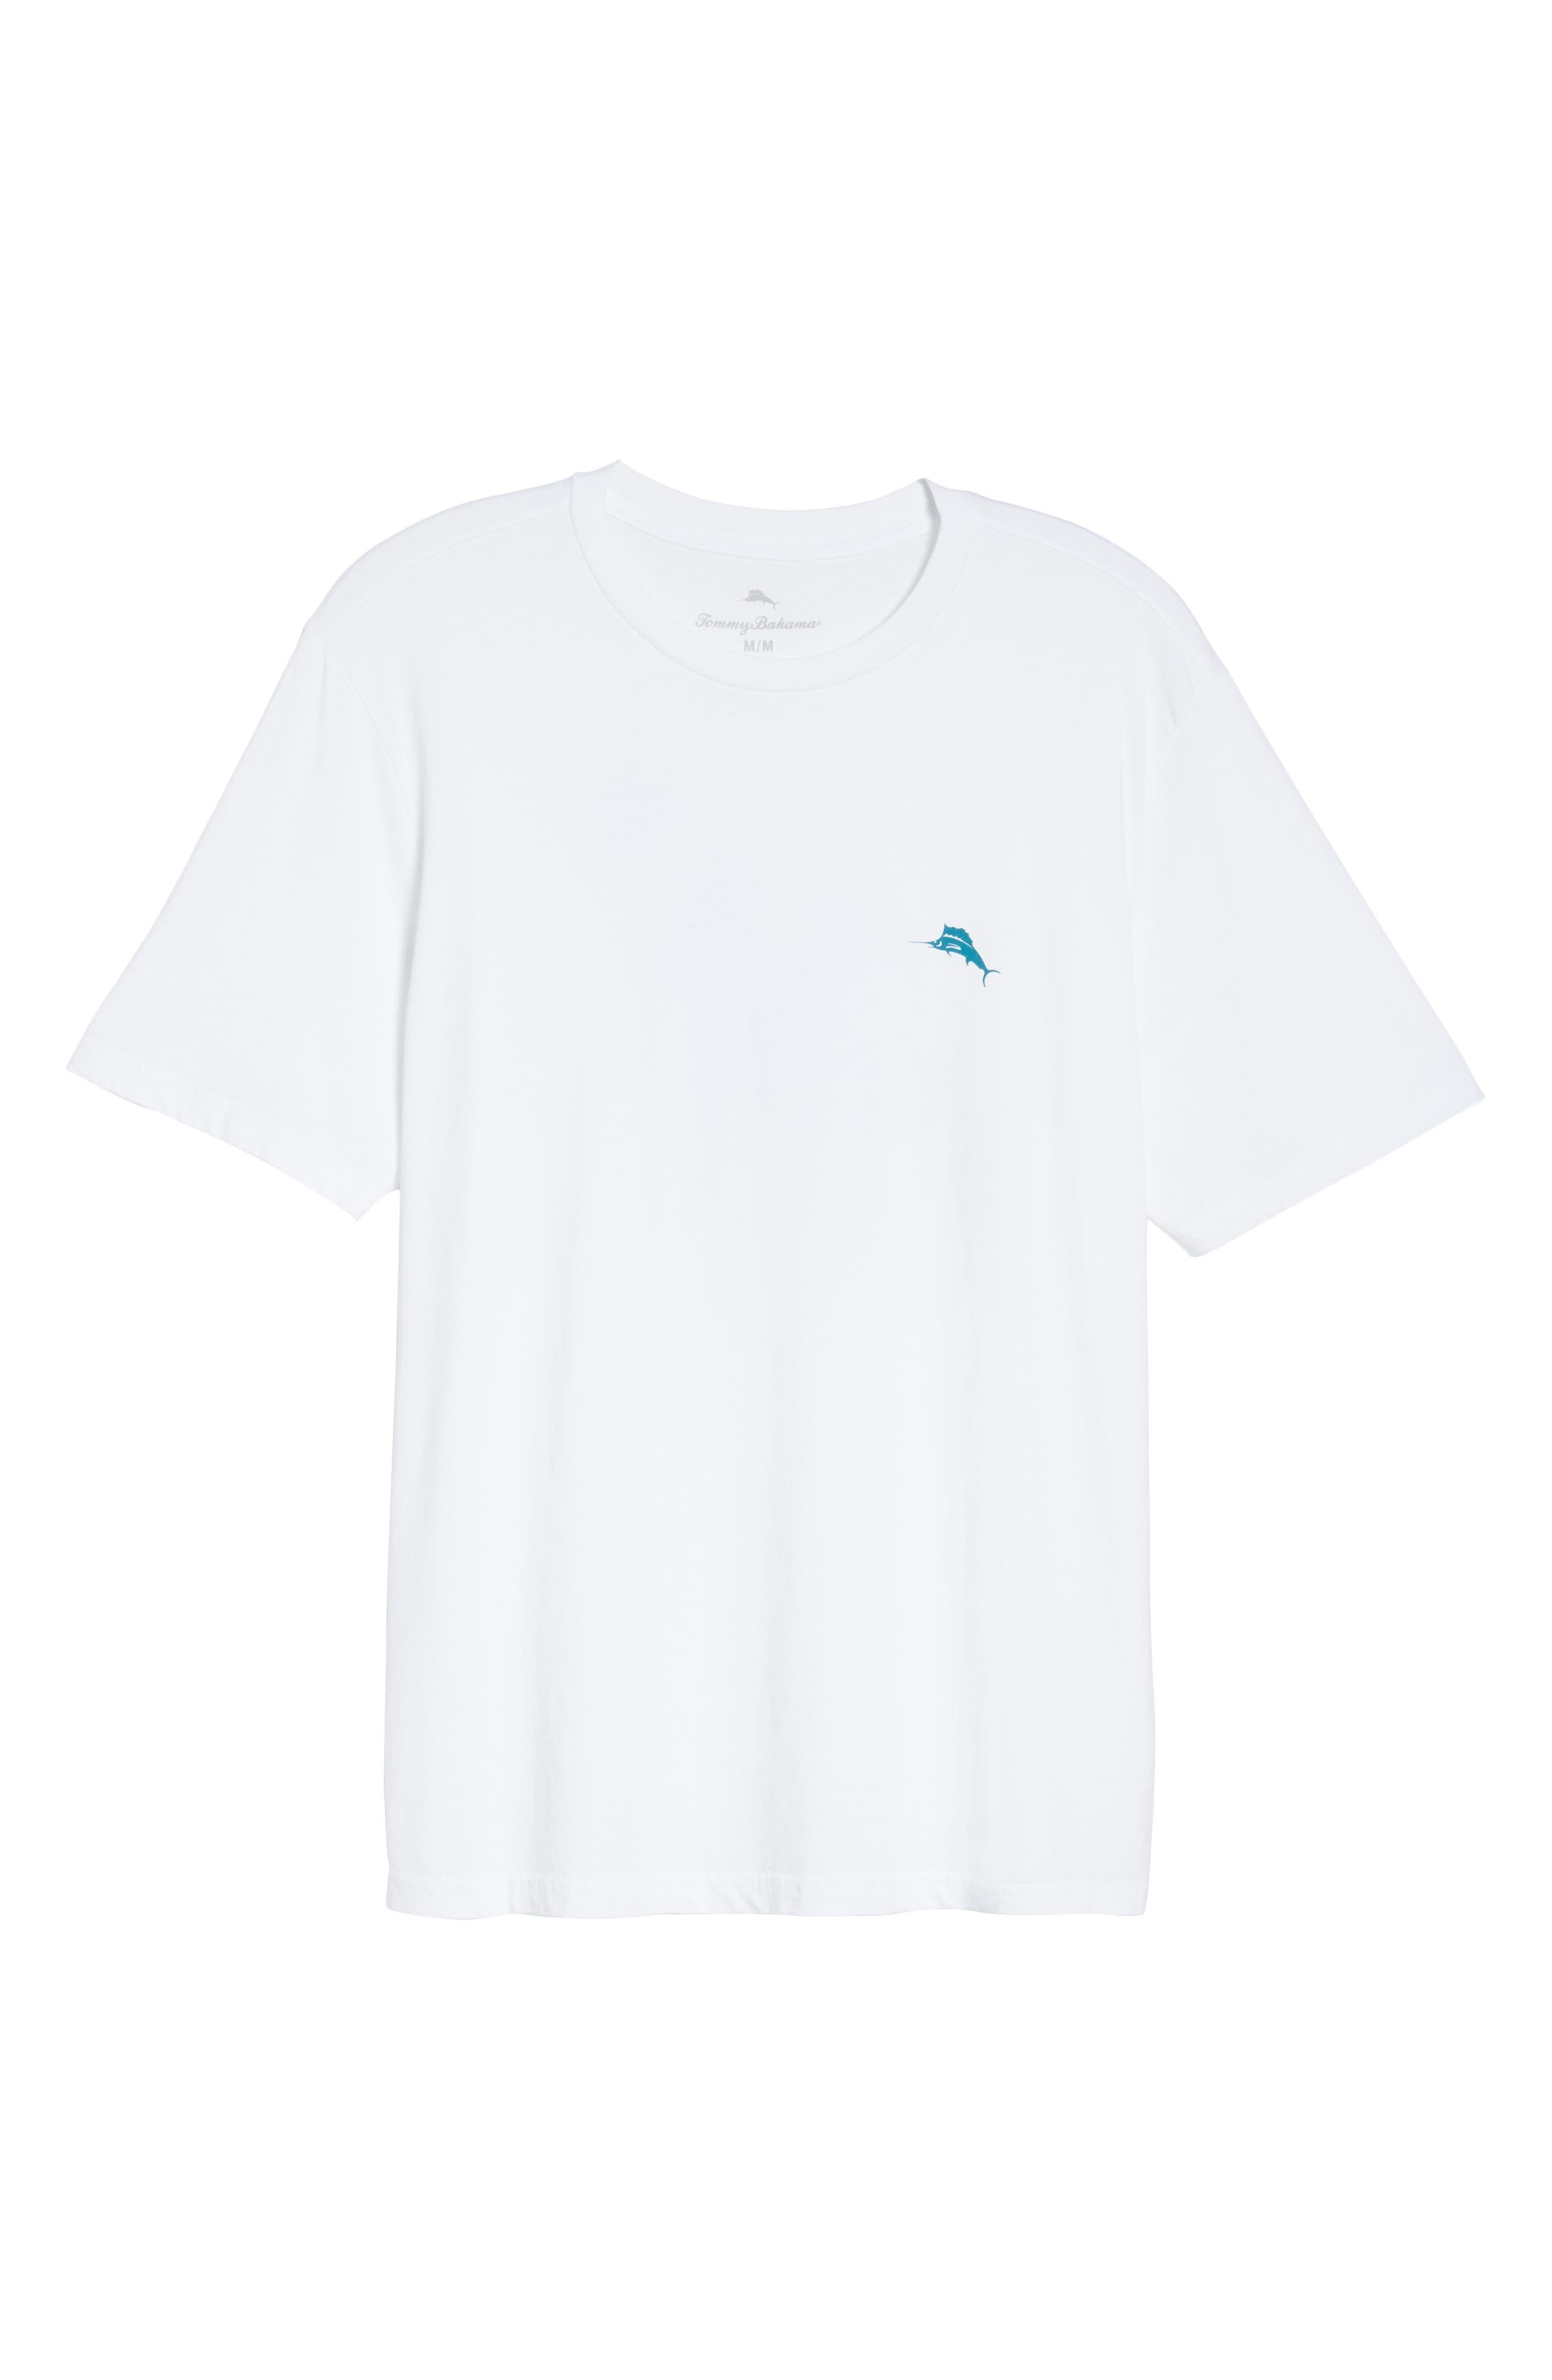 Parrot Pair T-Shirt,                             Alternate thumbnail 6, color,                             WHITE